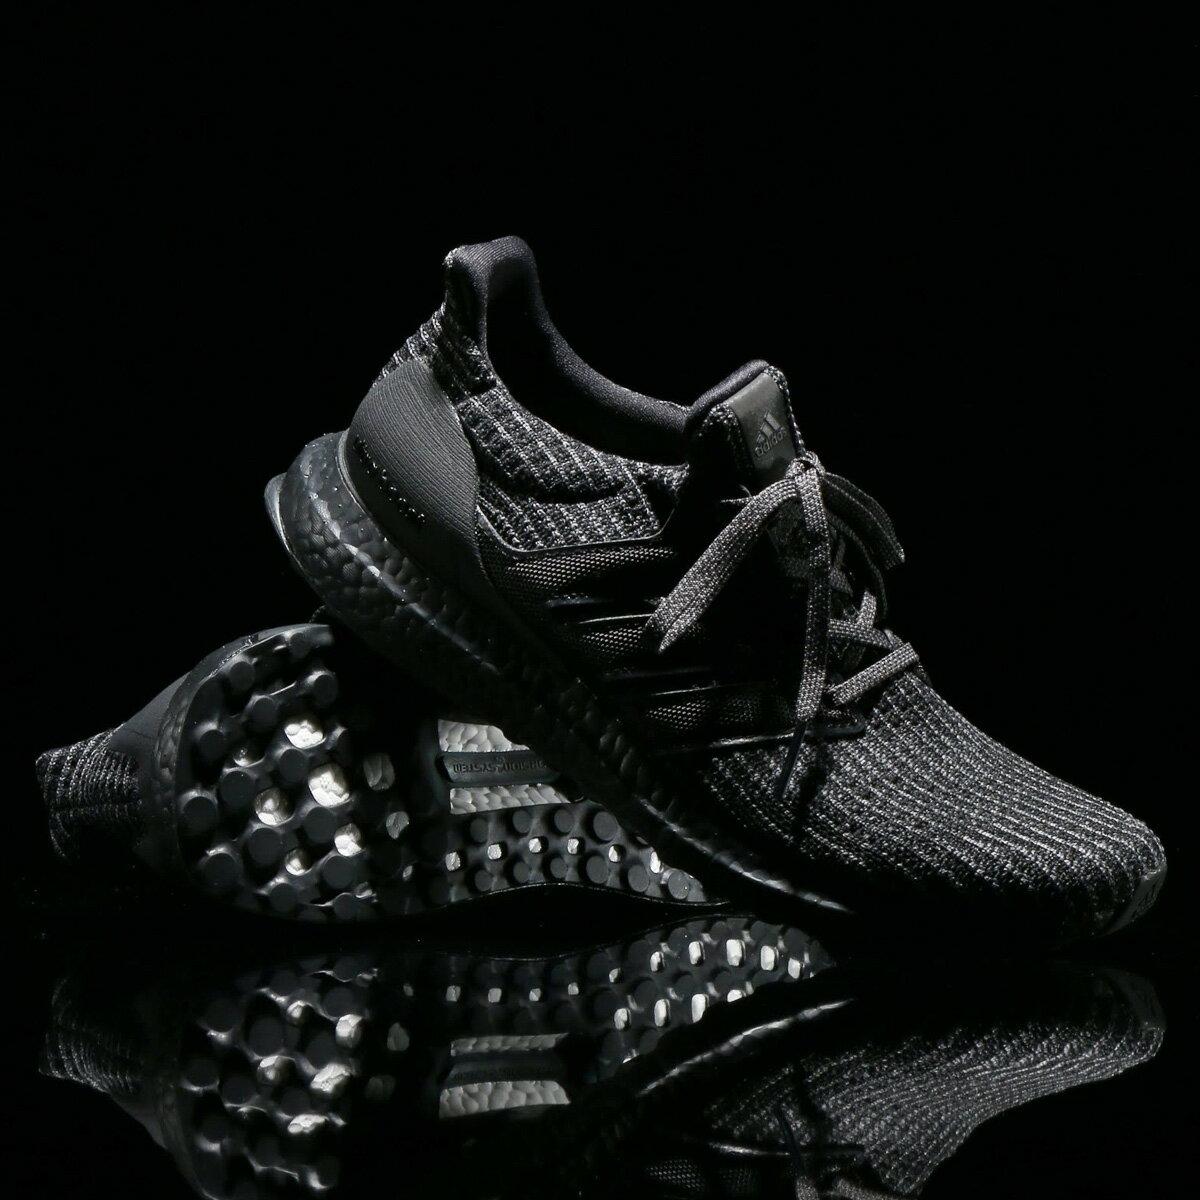 adidas Originals UltraBOOST LTD (アディダス オリジナルス ウルトラブースト LTD) Core Black/Core Black/Core Black【メンズ スニーカー】18SS-I